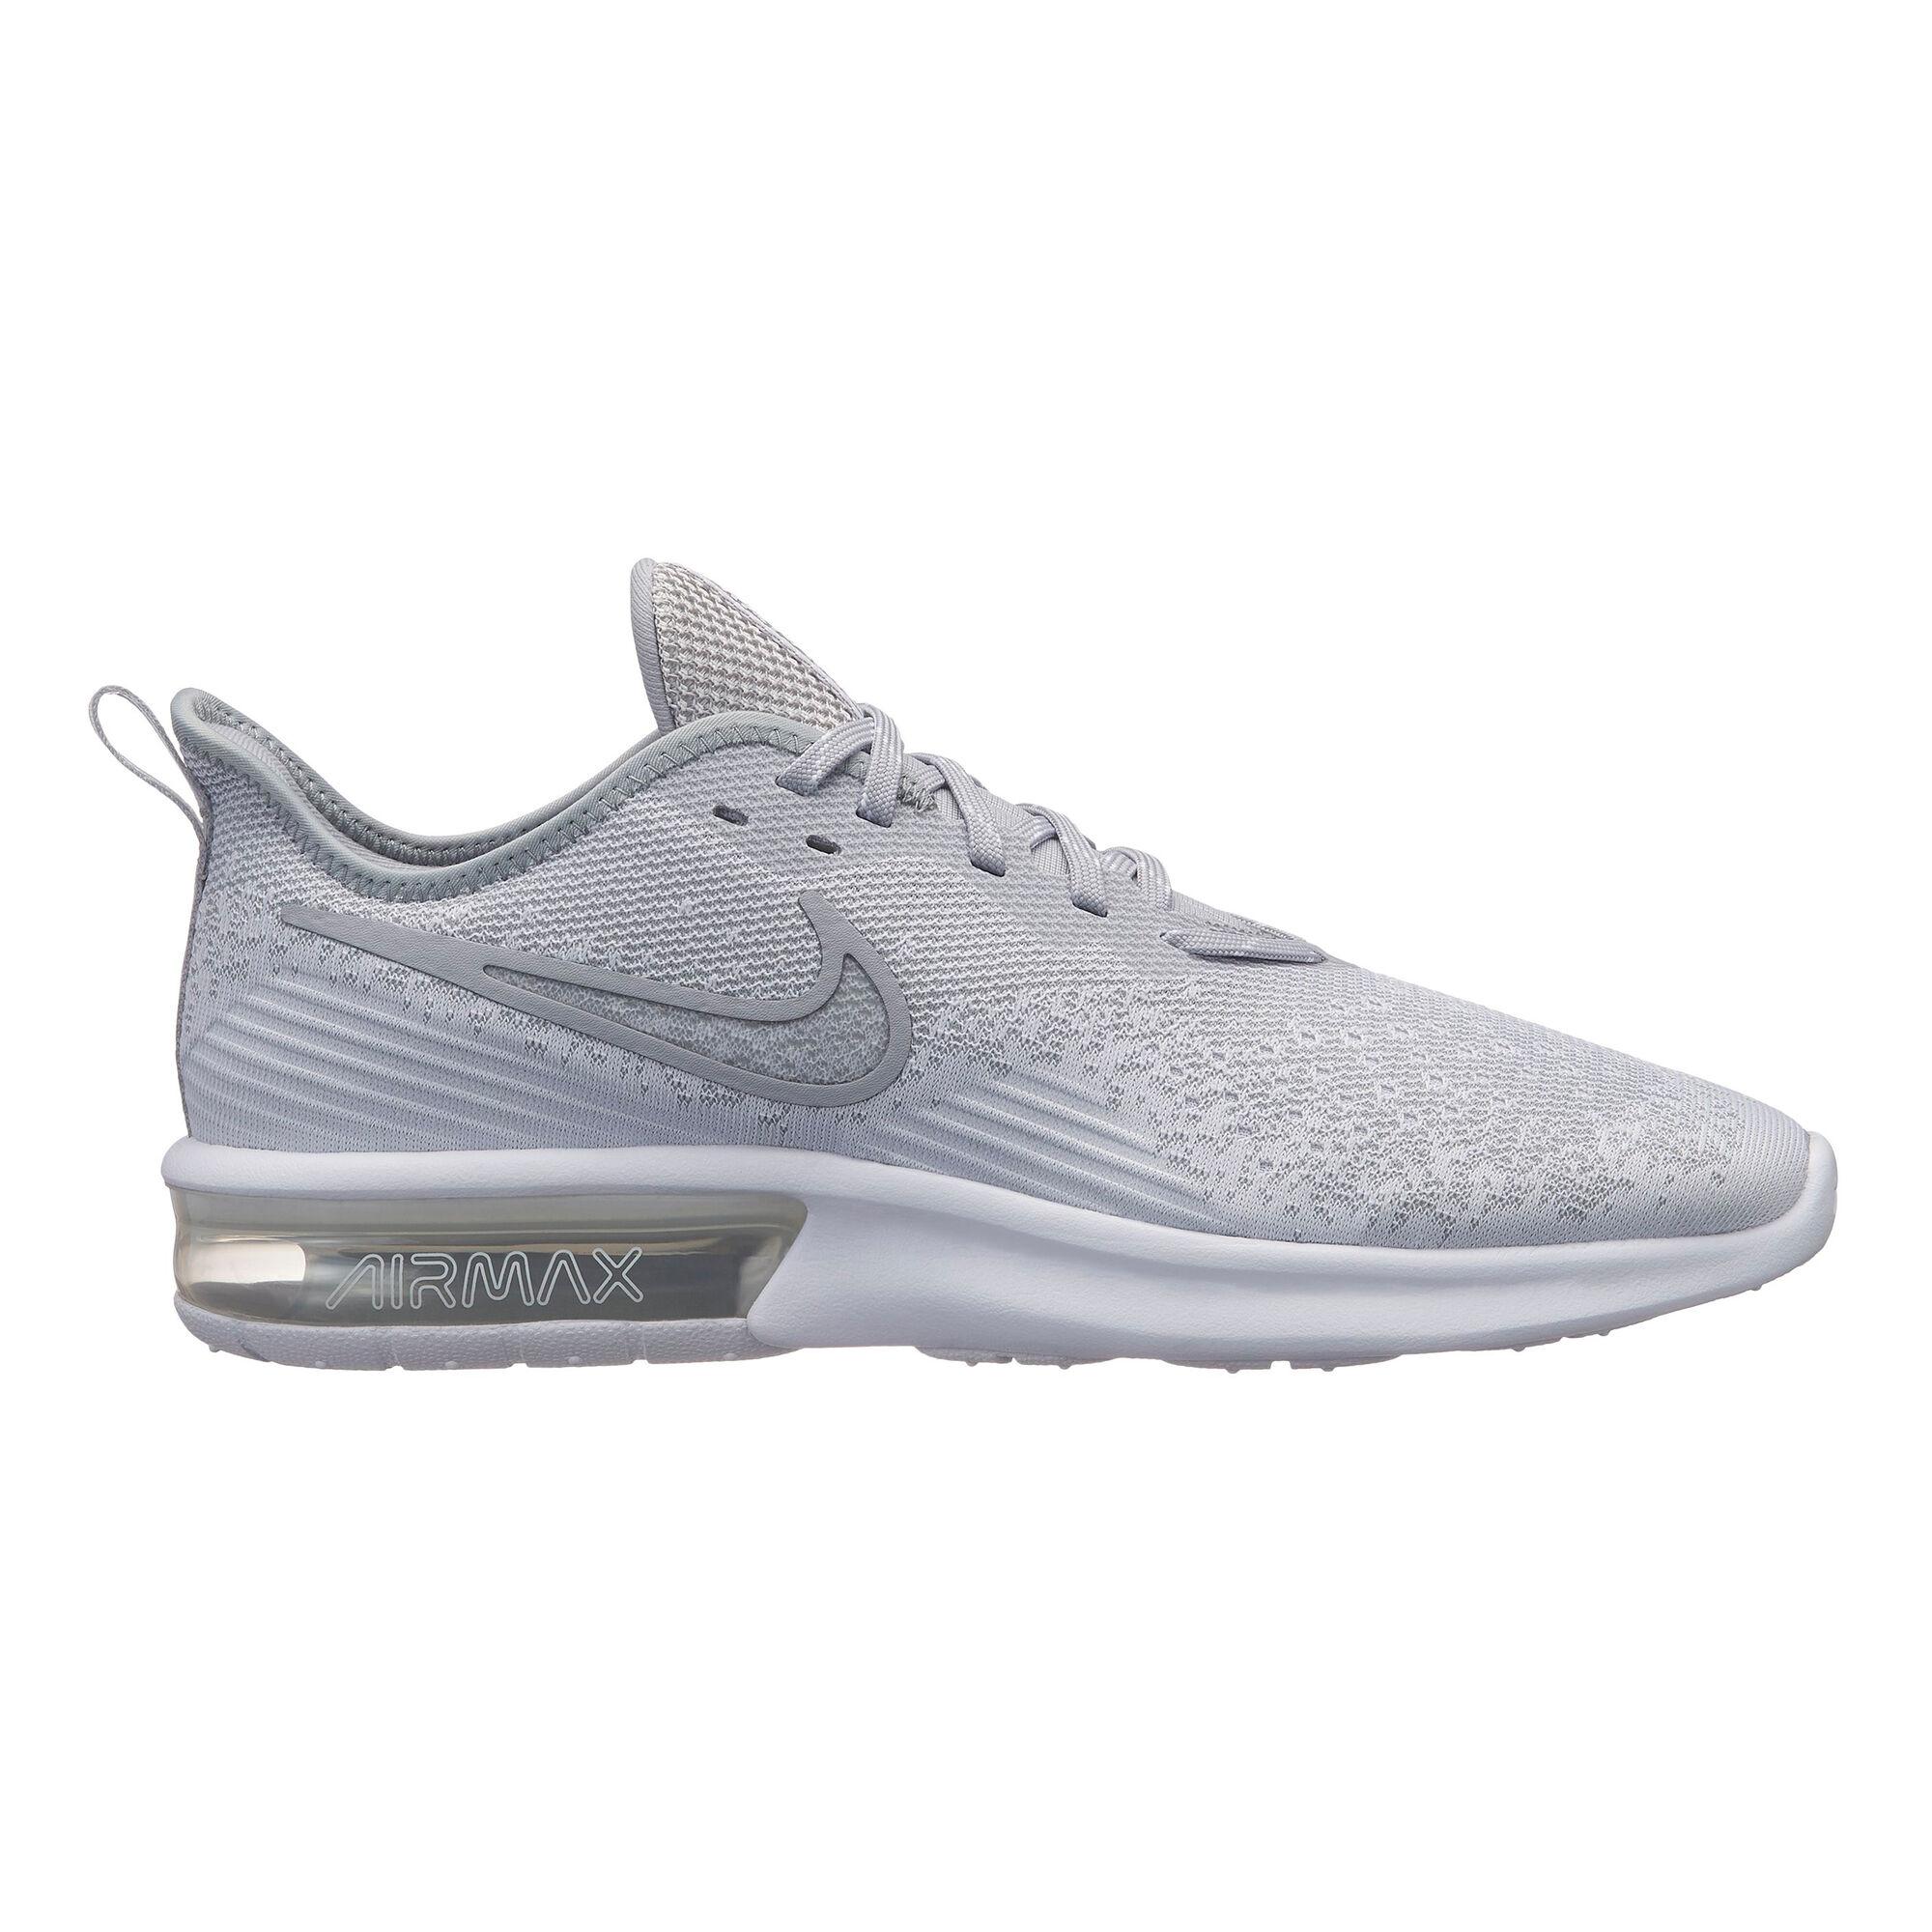 3fc7e0ed3042e buy Nike Air Max Sequent 4 Neutral Running Shoe Men - Lightgrey ...